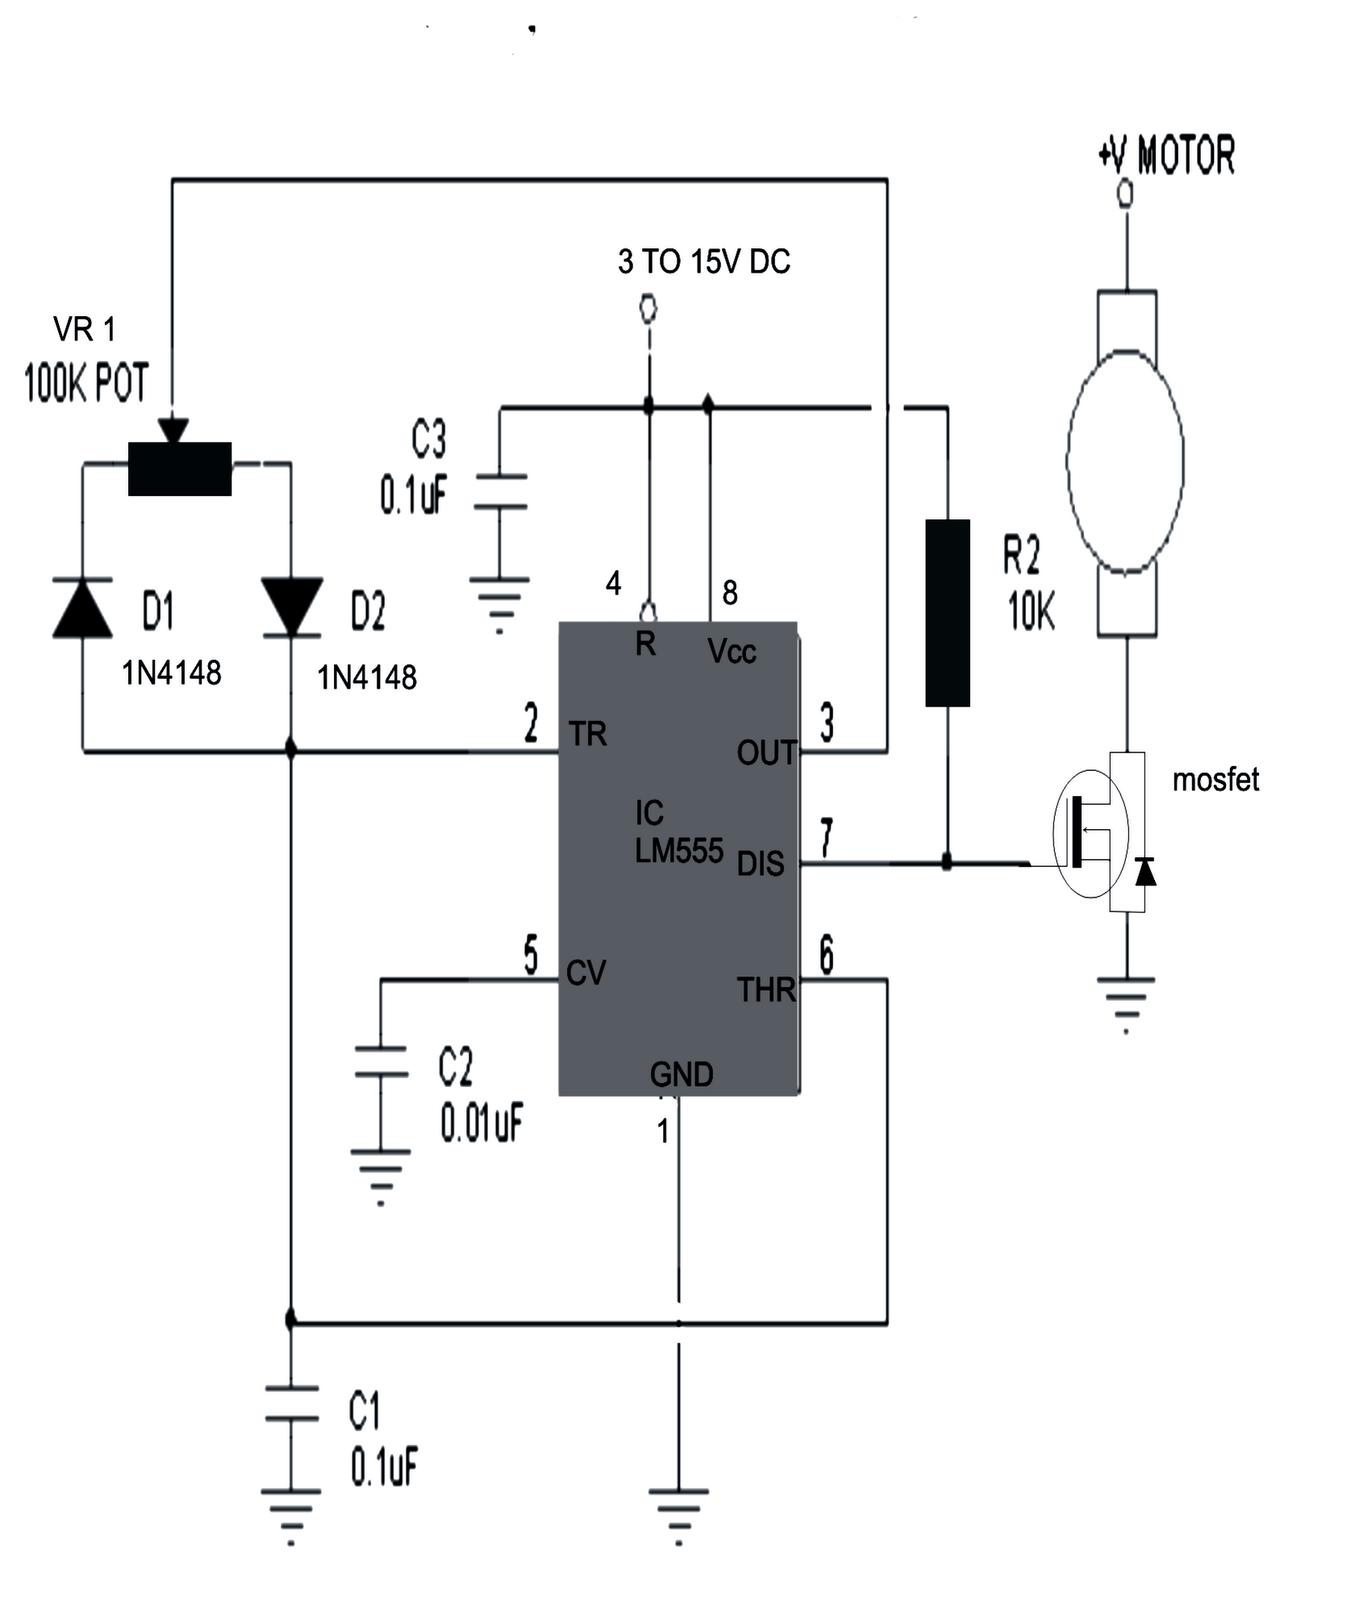 Pwm Motor Control Circuit